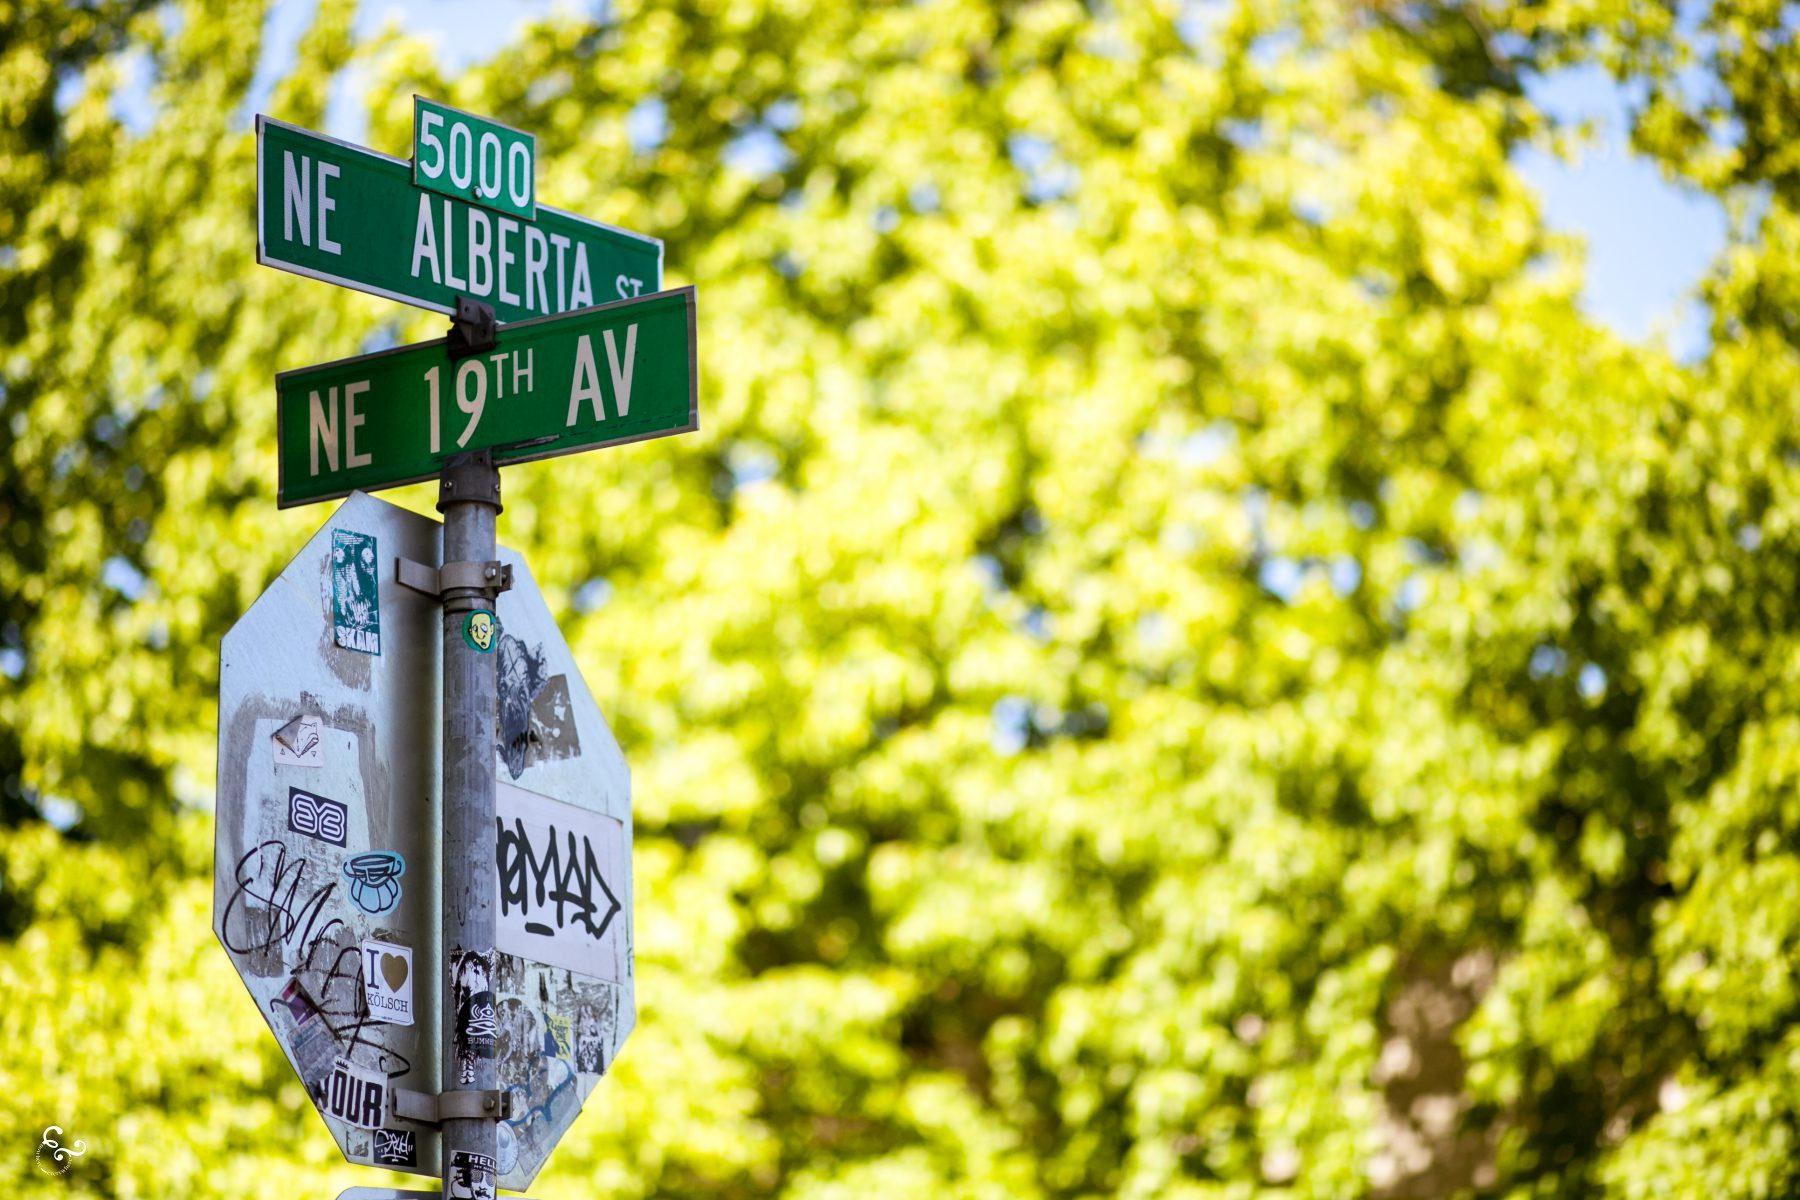 Portland Oregon United States Best Towns America Lis Dingjan Nowhere & Everywhere Travel Blog Photography Free Range Pixels